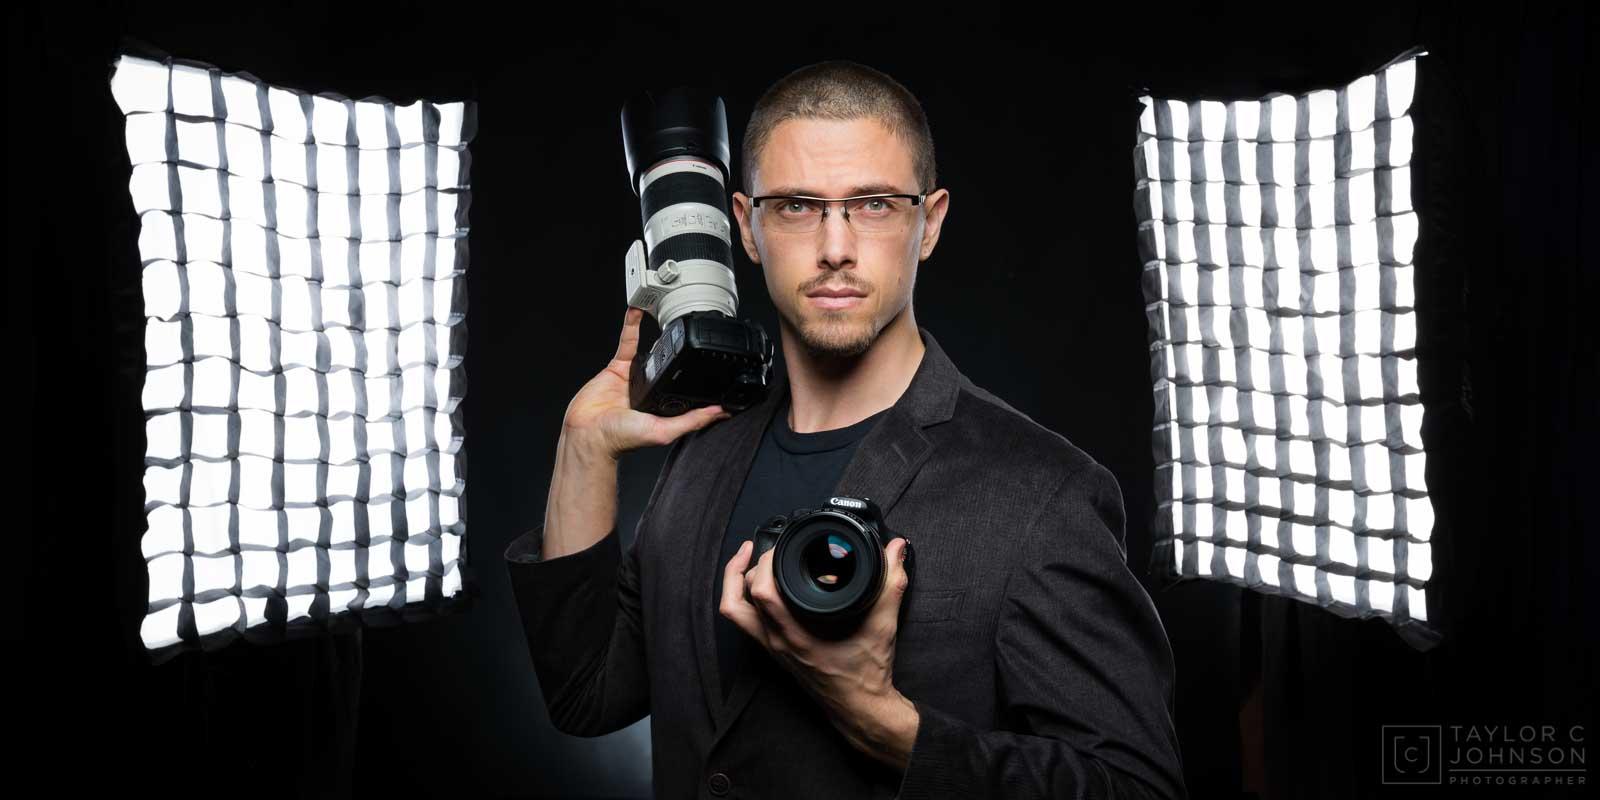 Asheville Commercial Photography - Headshot photography, product photography - Taylor Clark Johnson